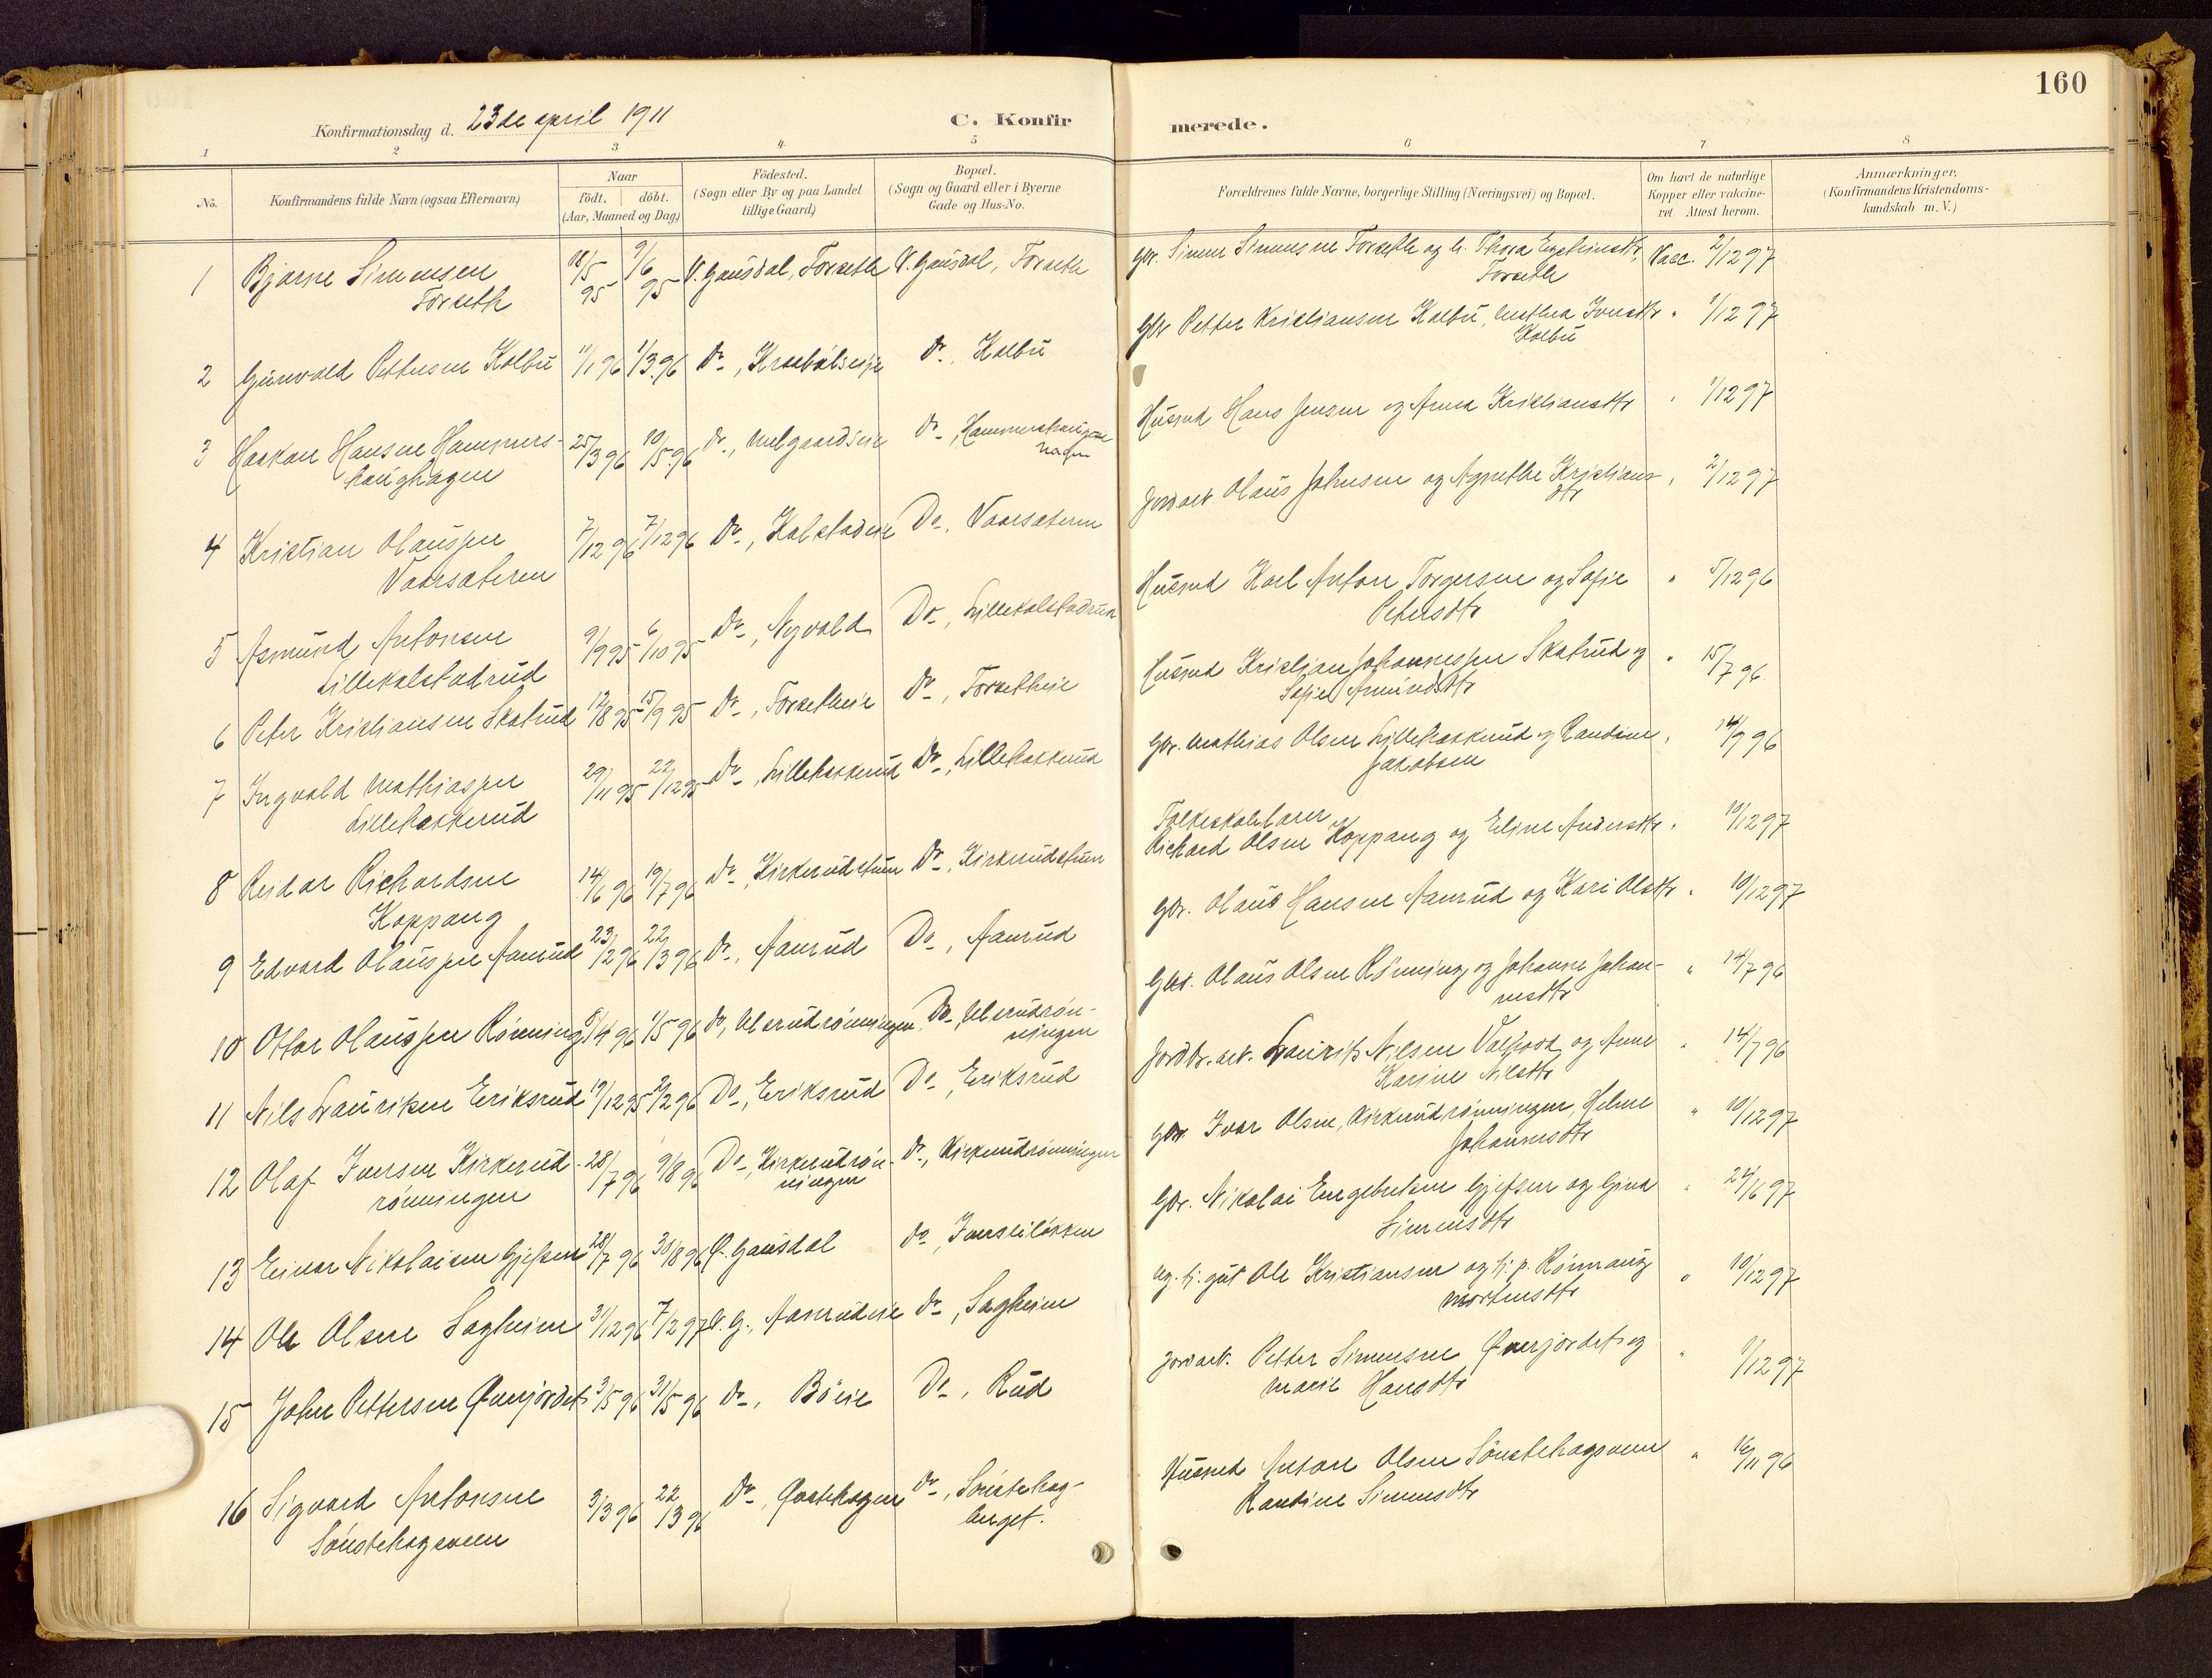 SAH, Vestre Gausdal prestekontor, Ministerialbok nr. 1, 1887-1914, s. 160